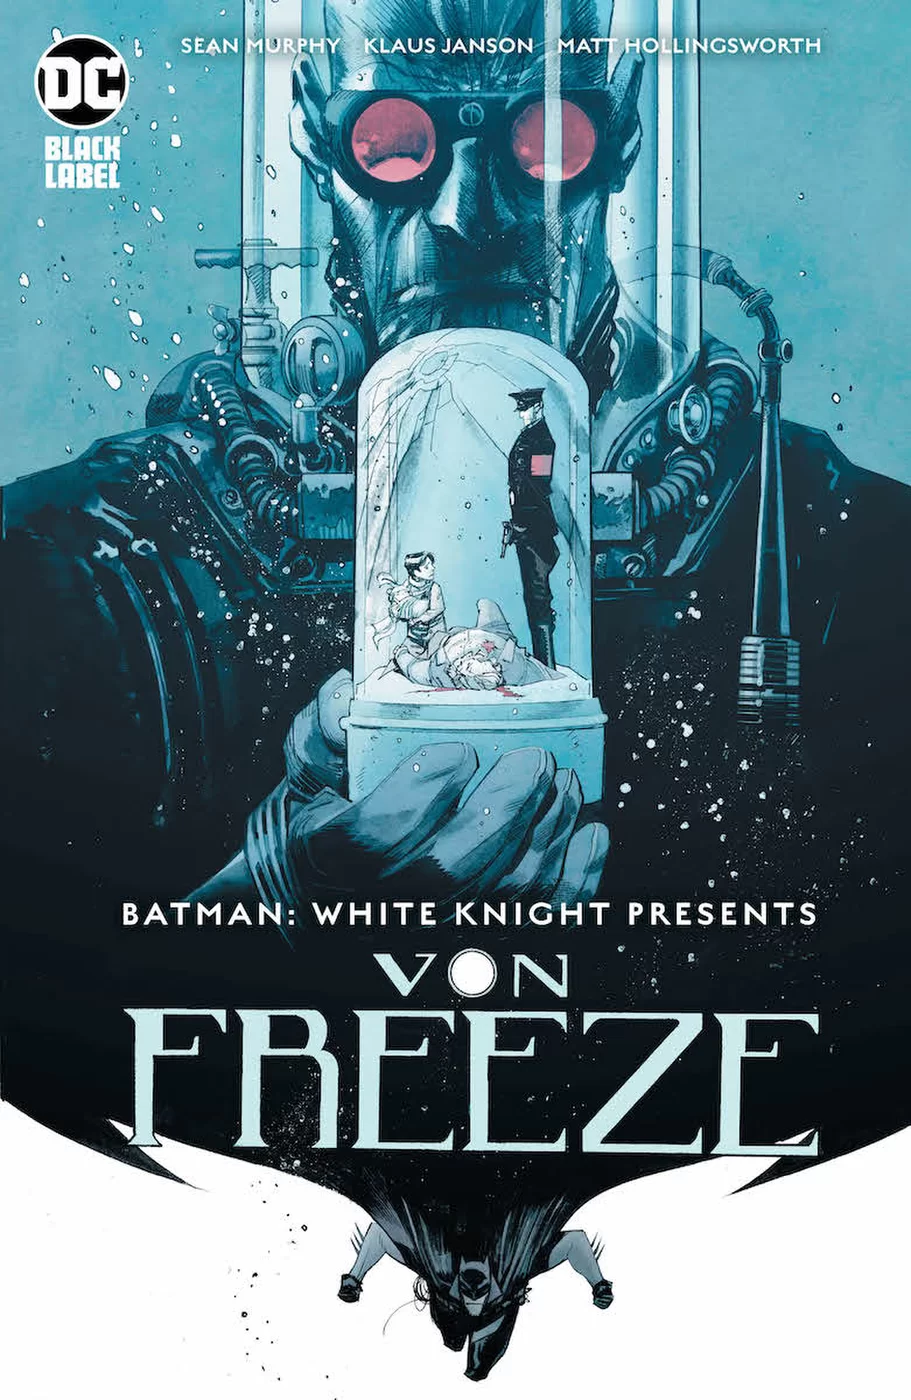 Batman: White Knight Presents Von Freeze #1, copertina di Sean Gordon Murphy